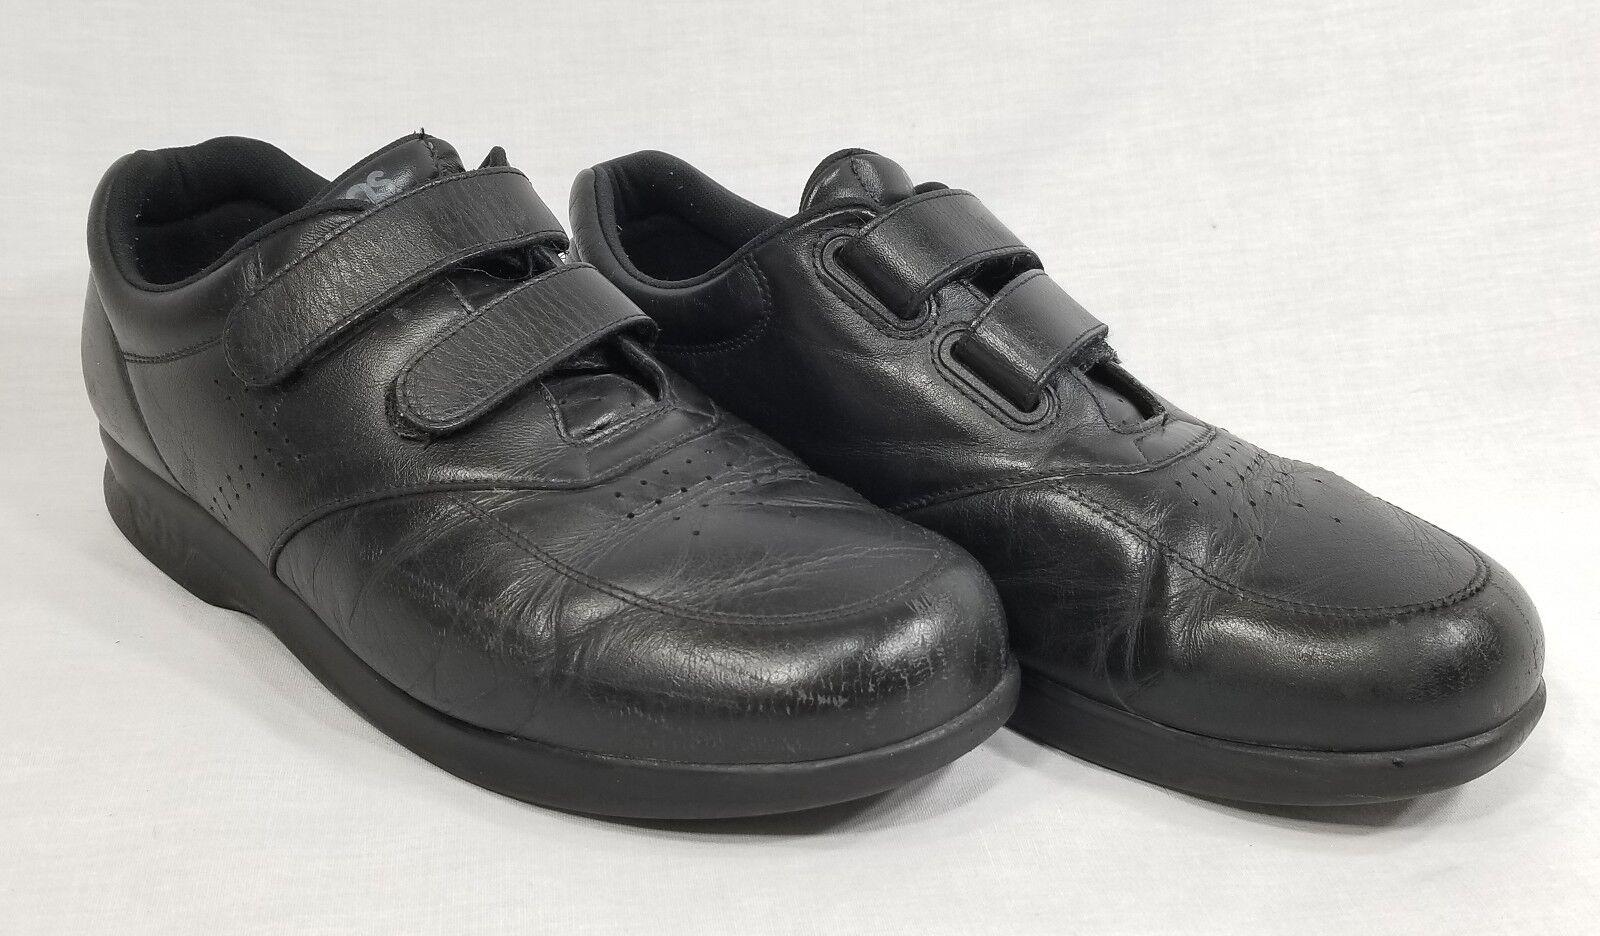 SAS Men's Time Out Velcro Black Orthopedic Sneaker Shoes Men's 11.5 M